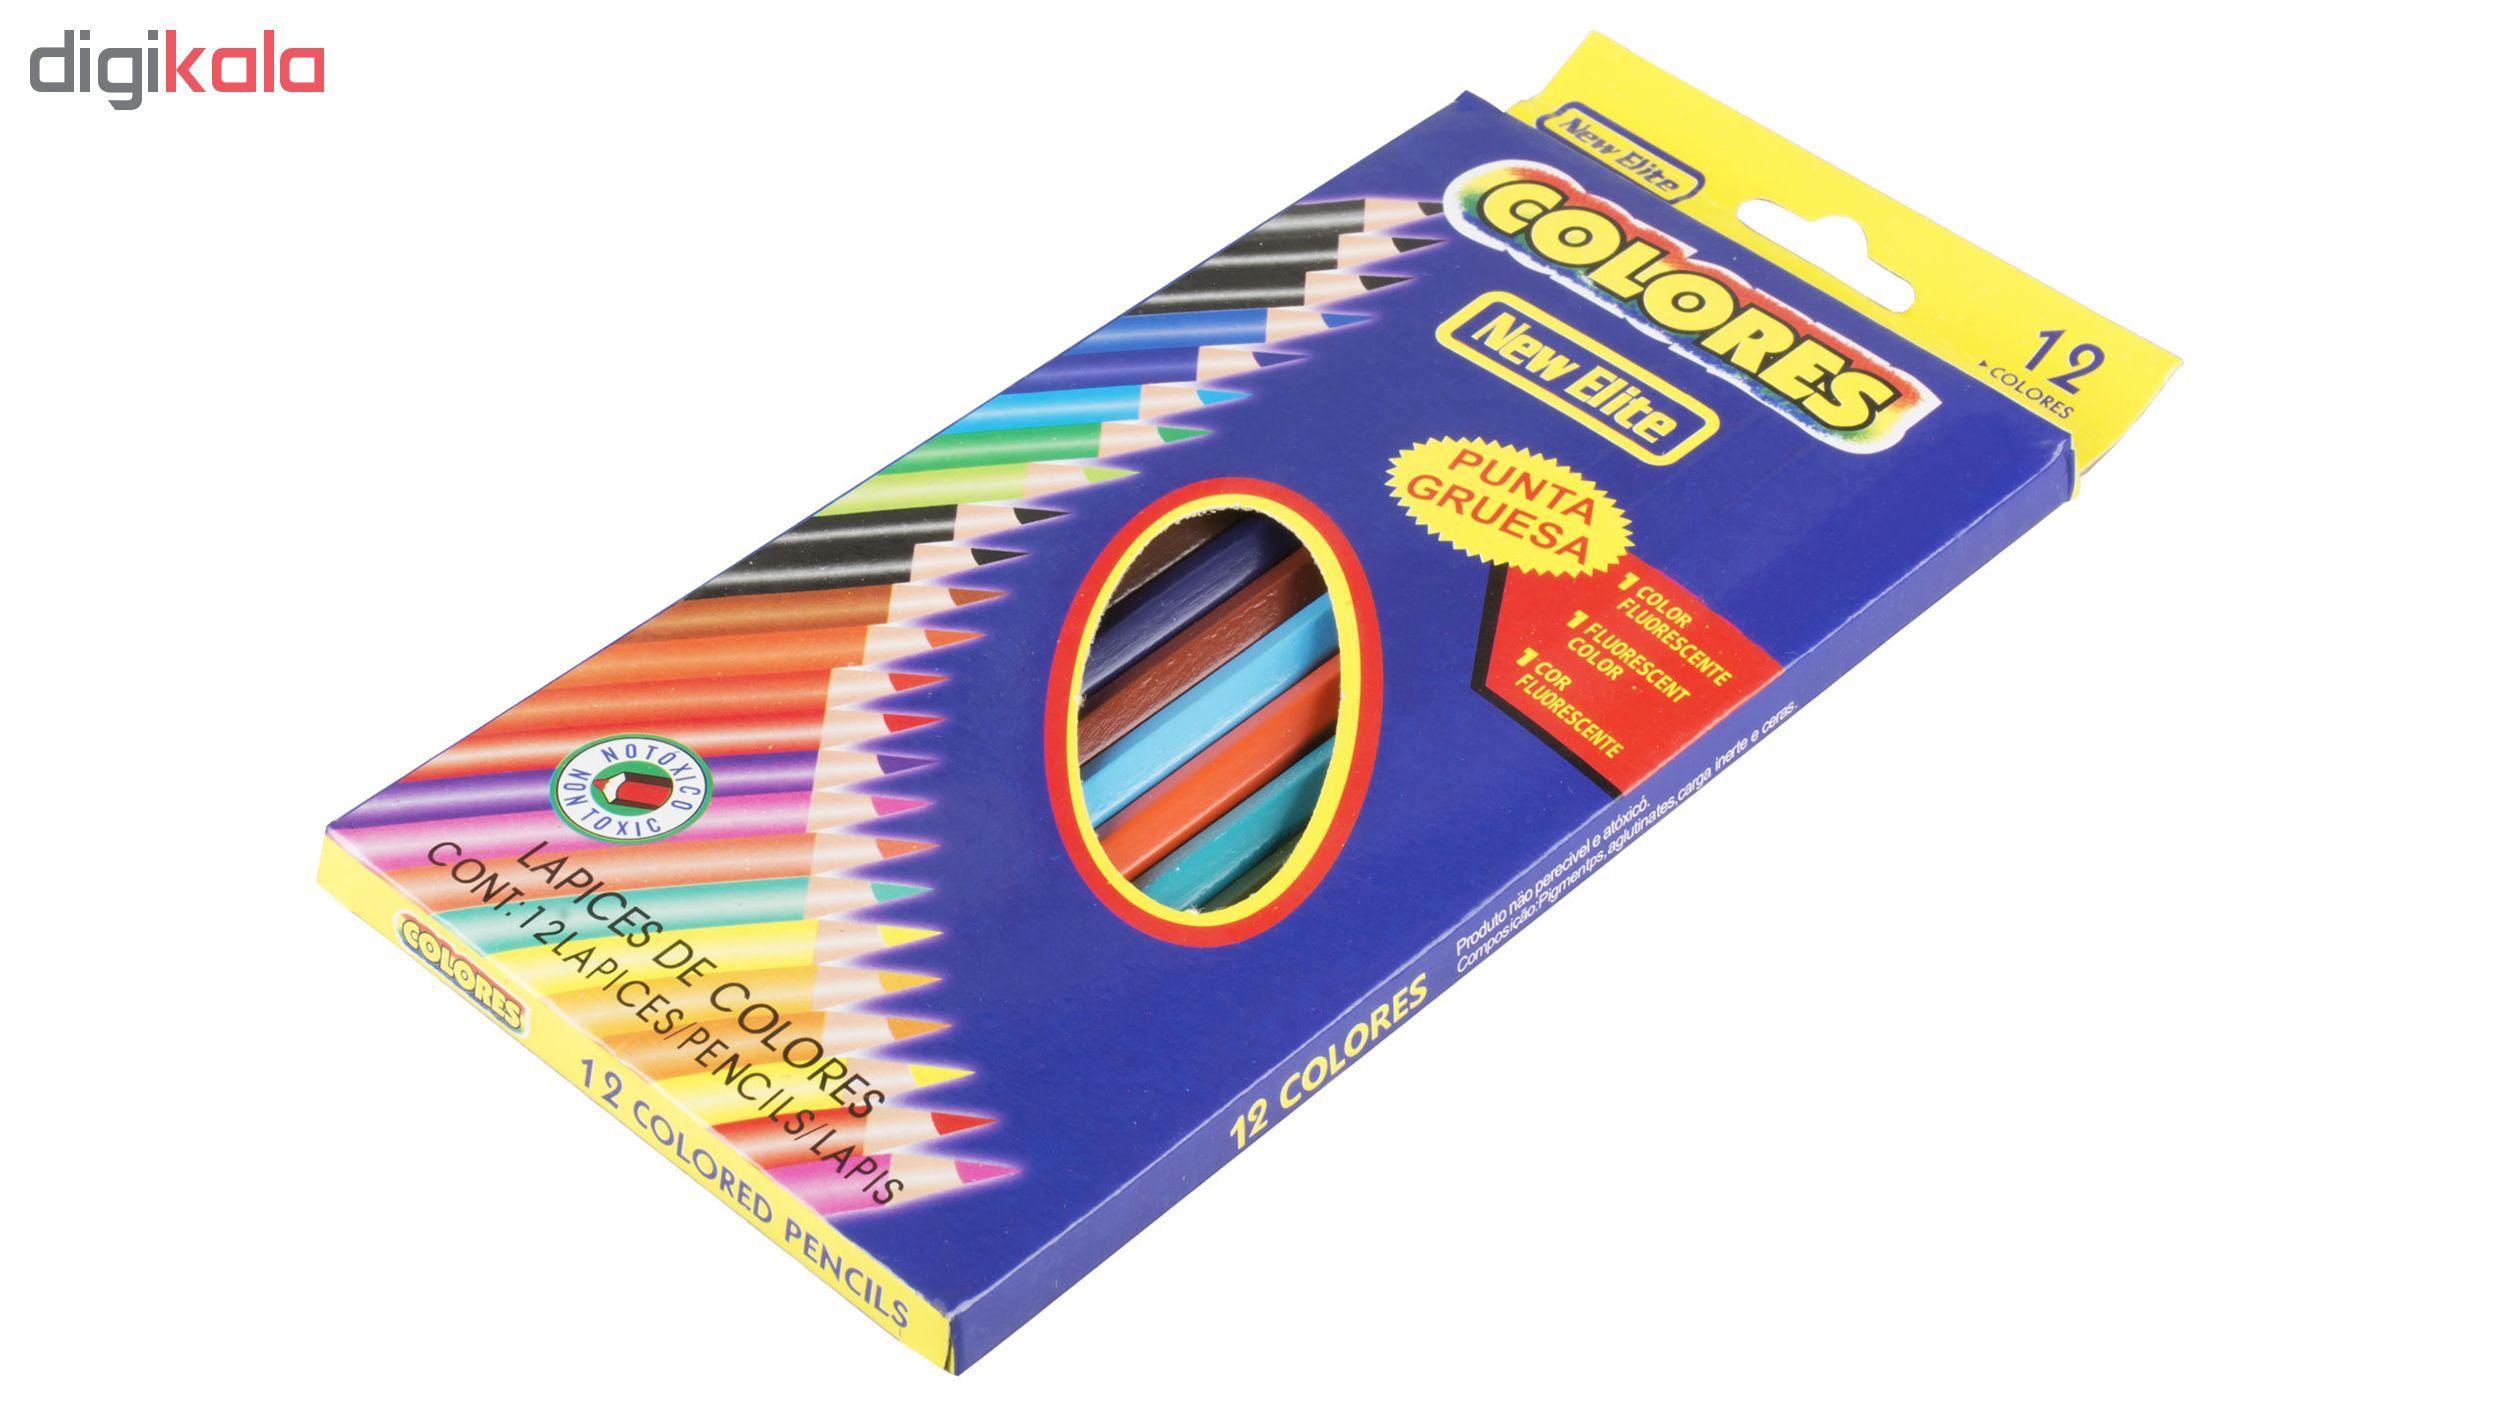 مداد رنگی 12 رنگ نیو الیت مدل Colores main 1 2